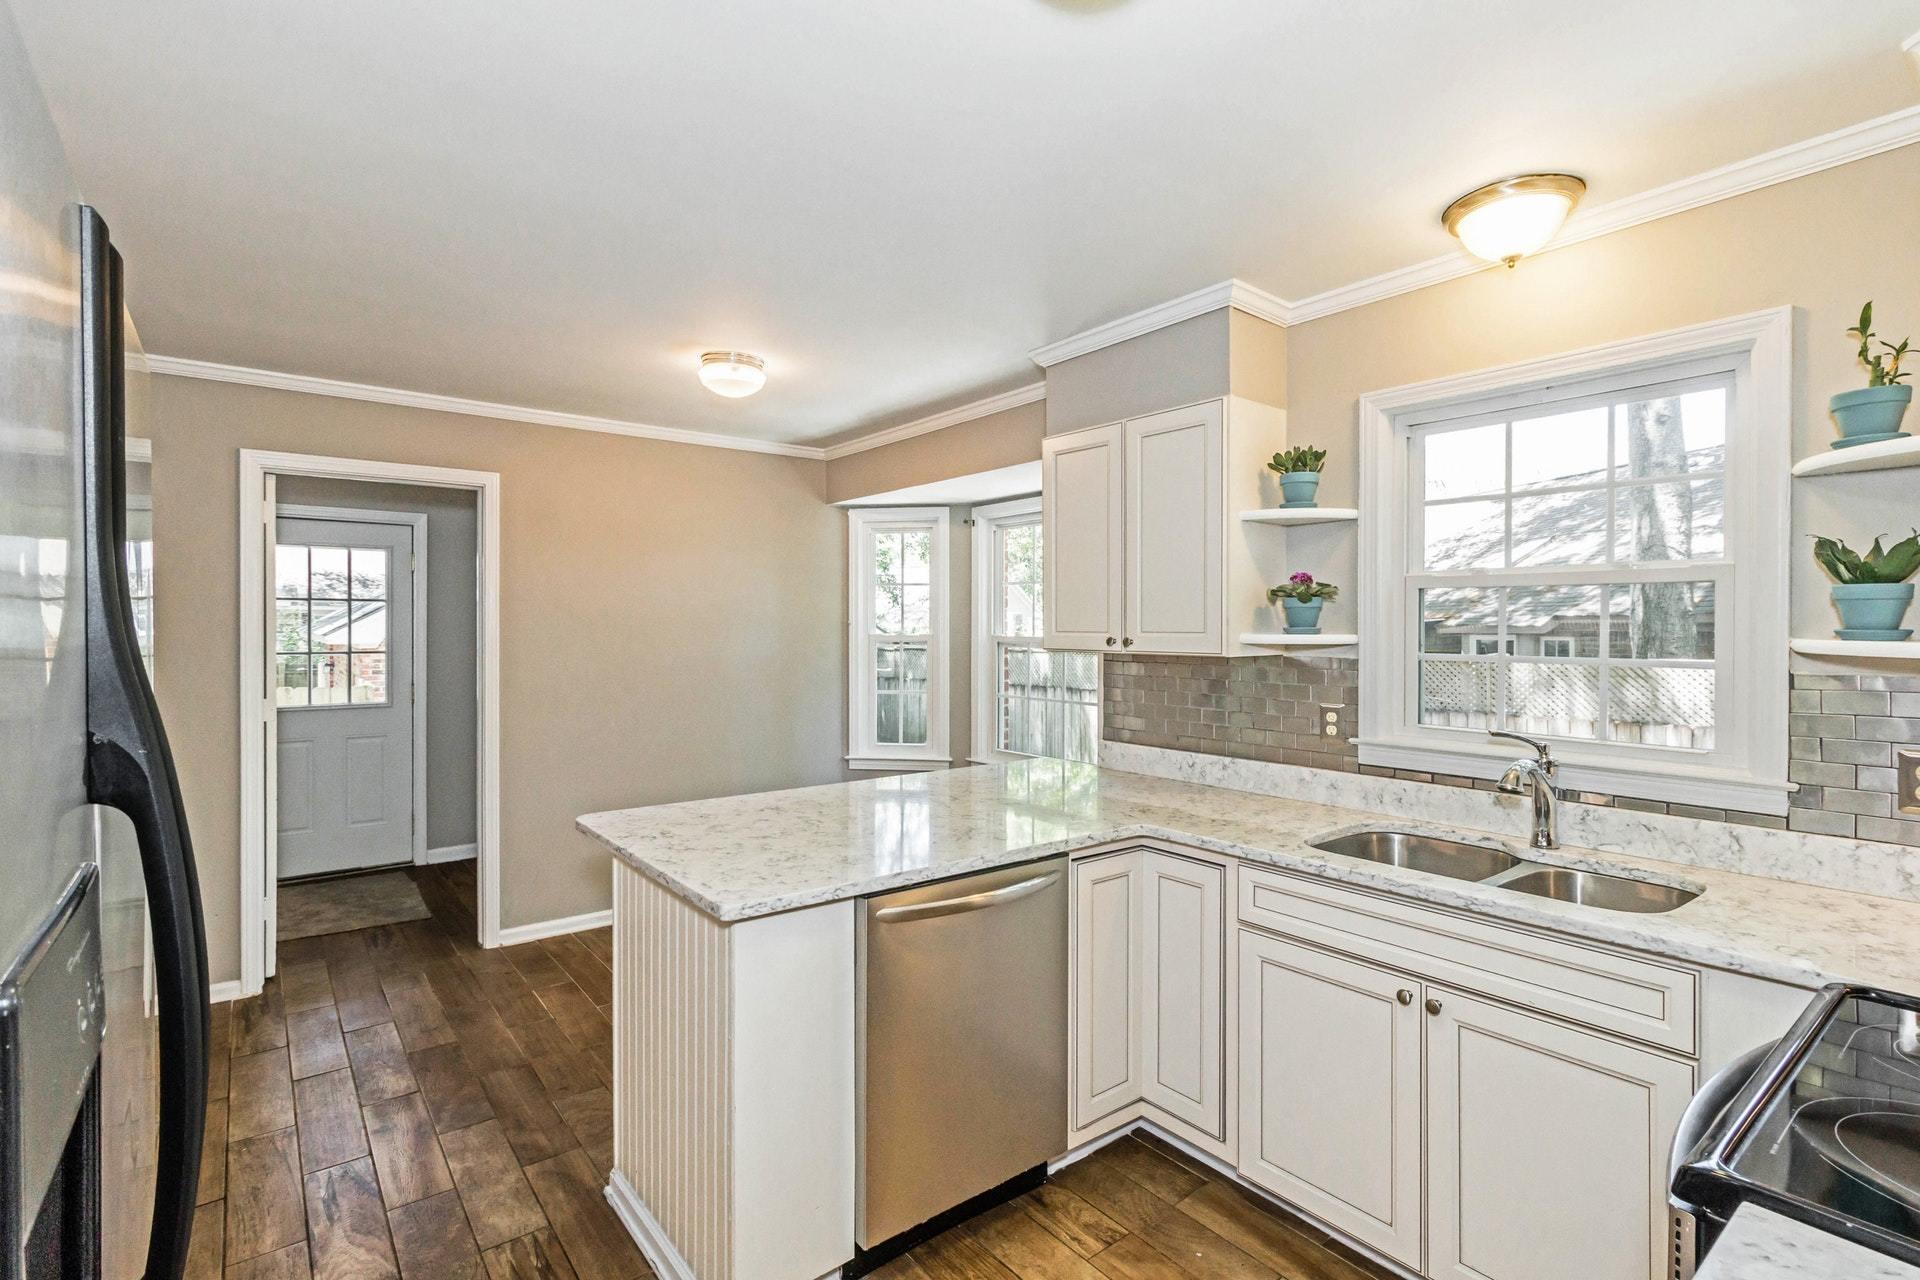 Shemwood II Homes For Sale - 969 Sea Gull, Mount Pleasant, SC - 21